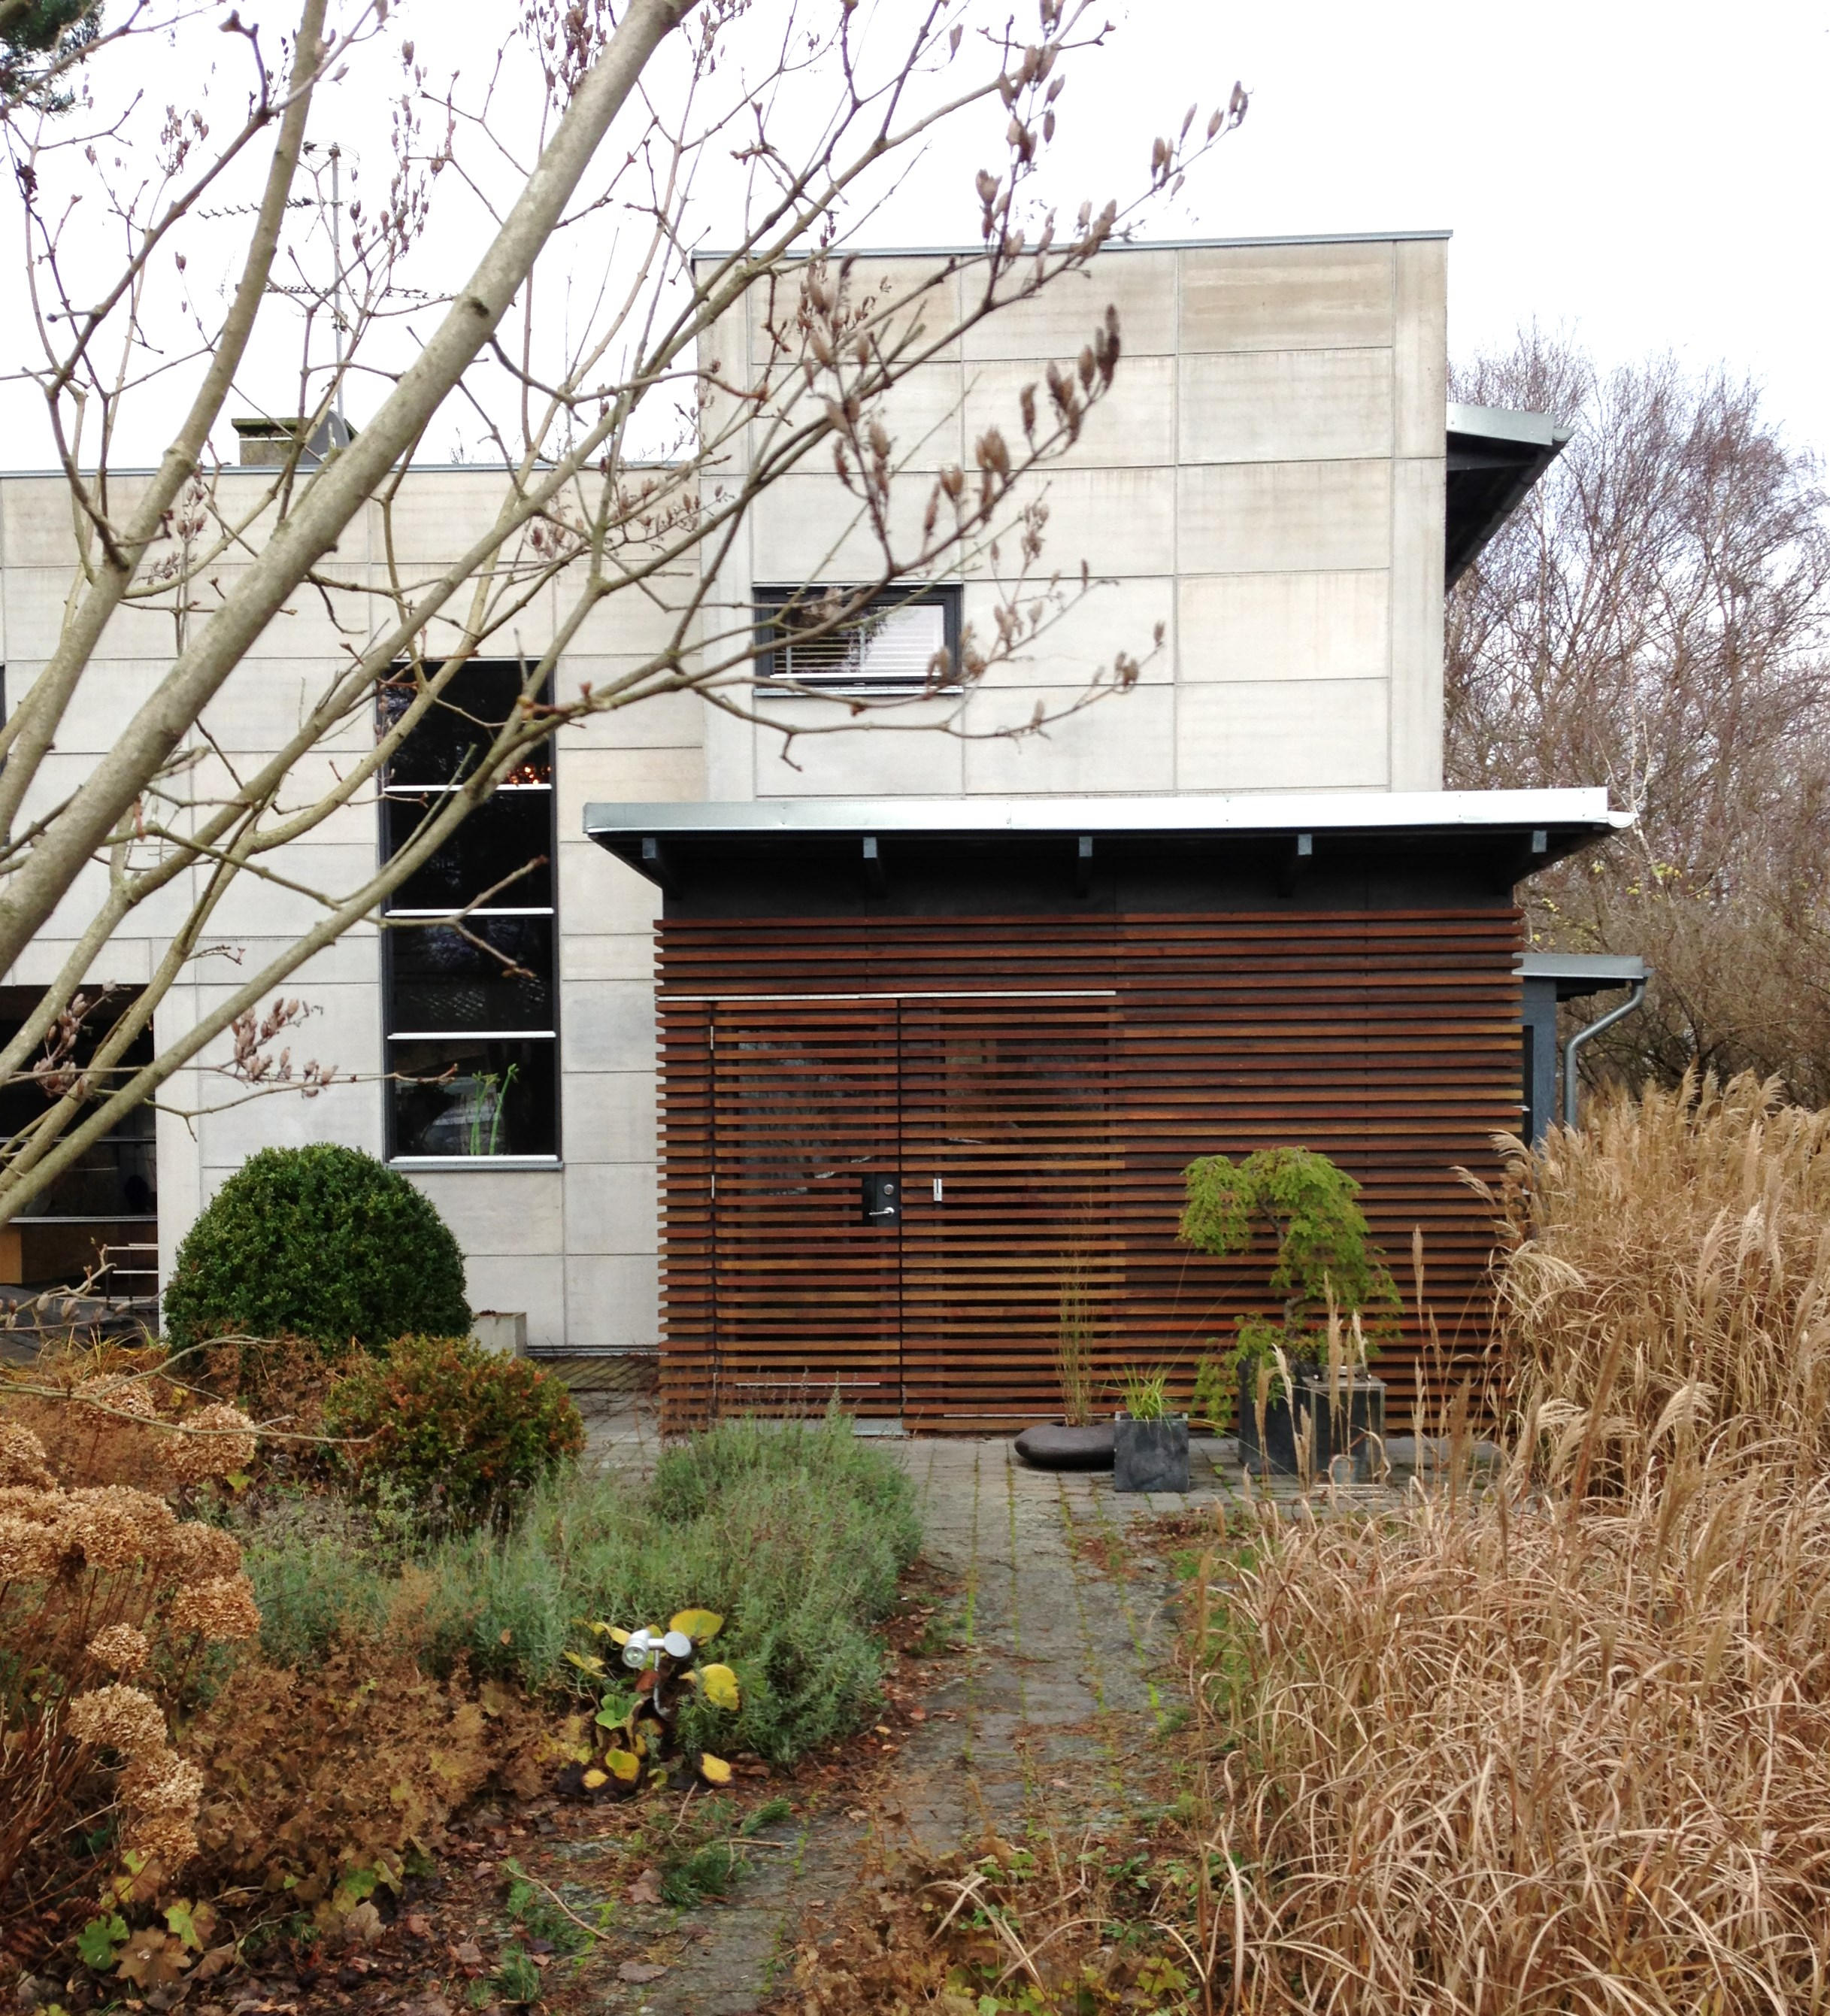 Hus-fasad-trädgård-